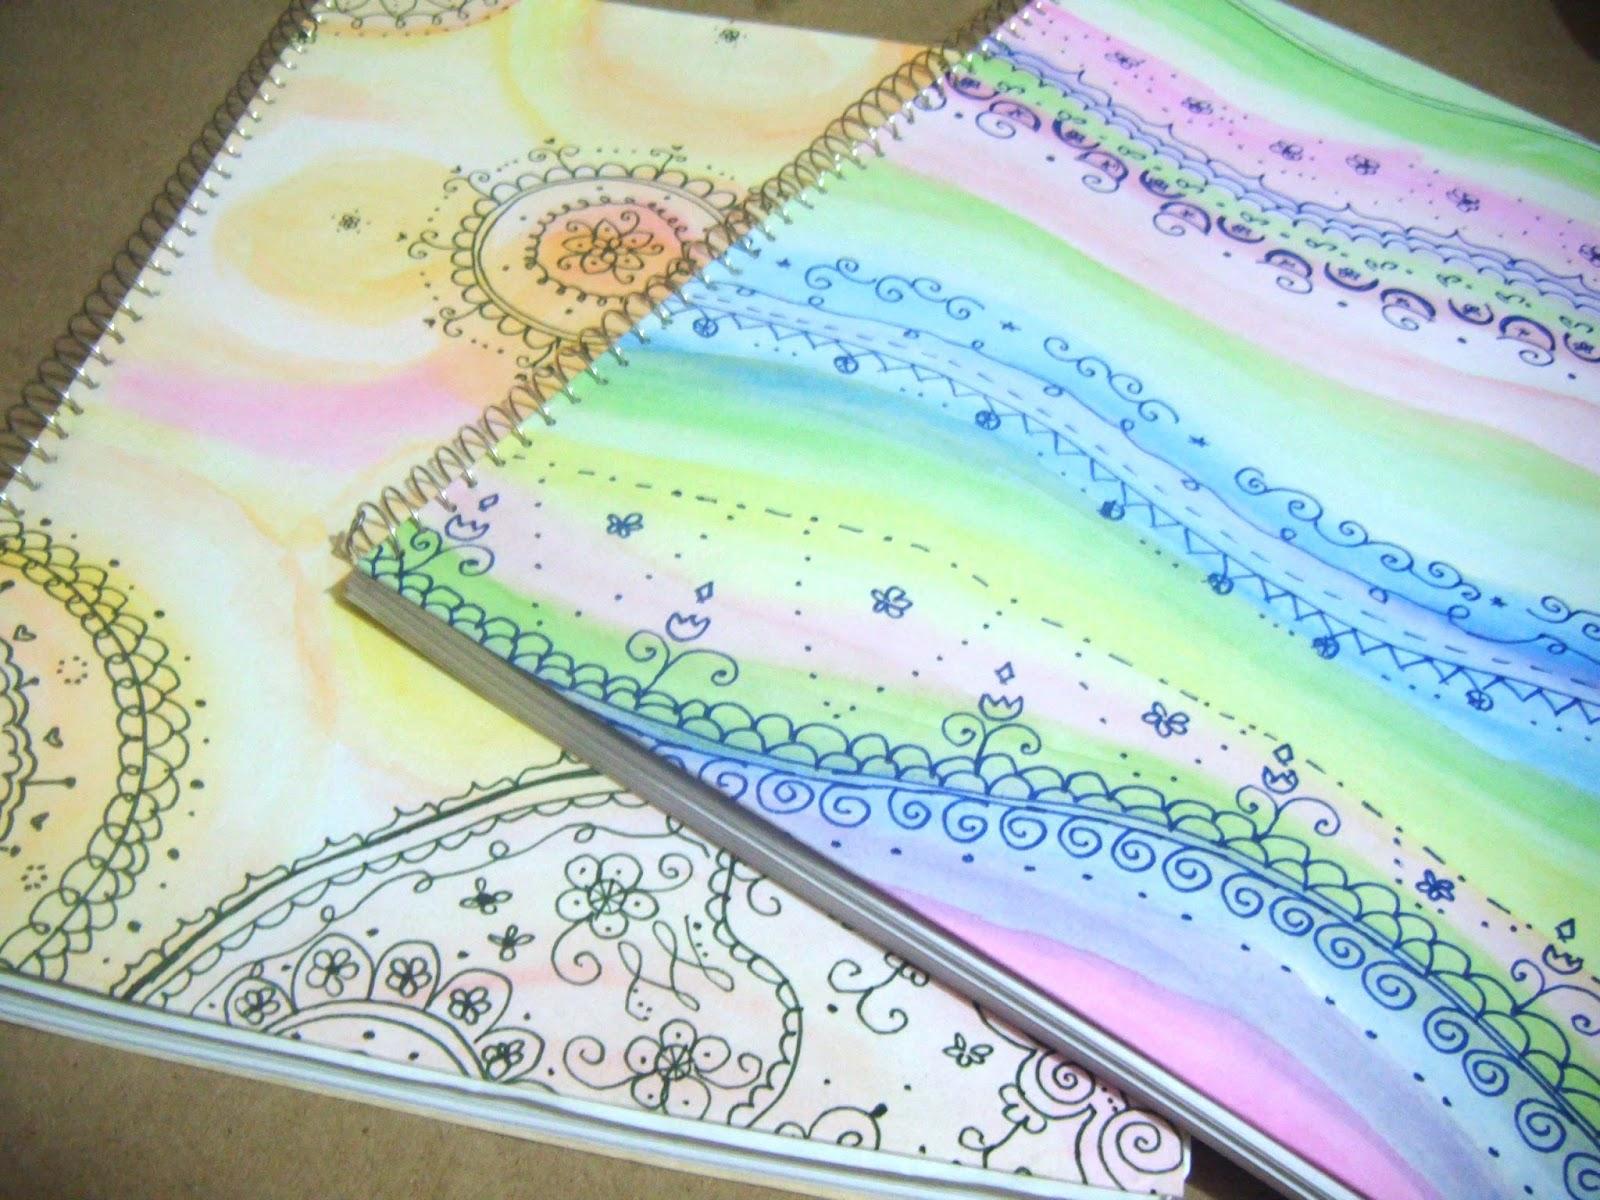 Portadas Para Cuadernos Decora Tus Libretas Con Dibujos: Decora Tus Libretas Parte 1.